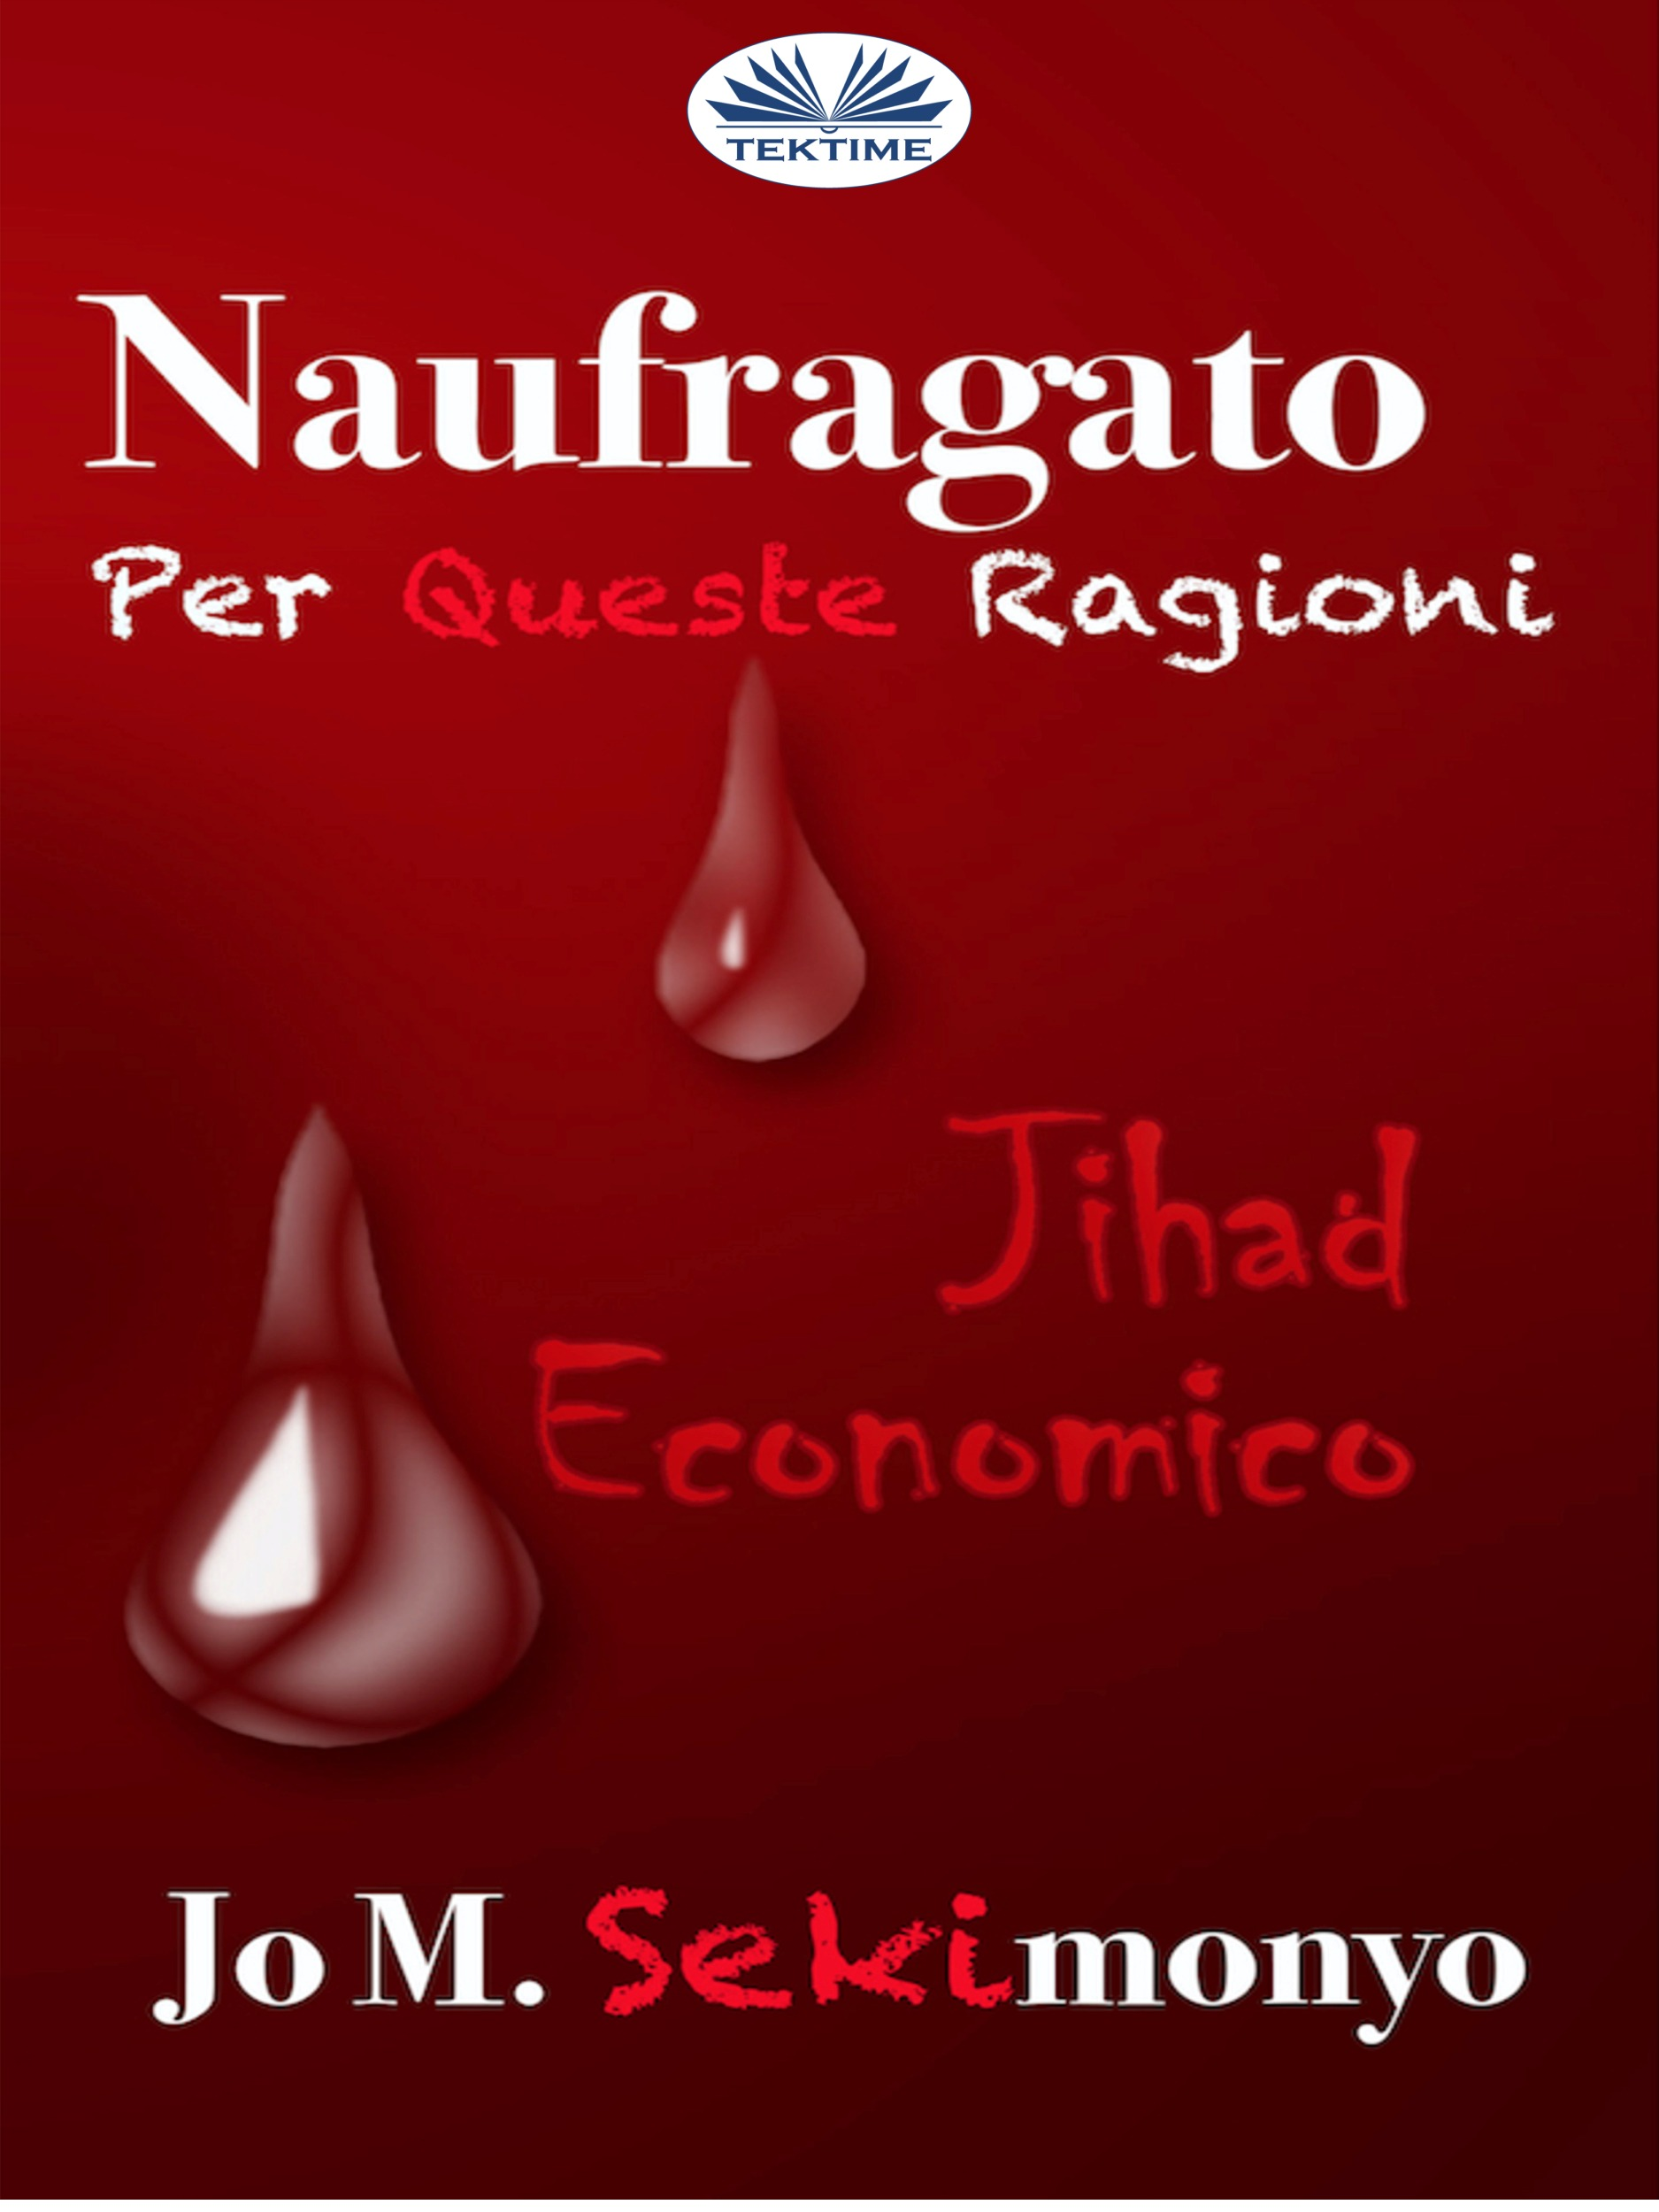 Обложка книги Naufragato: Per Queste Ragioni